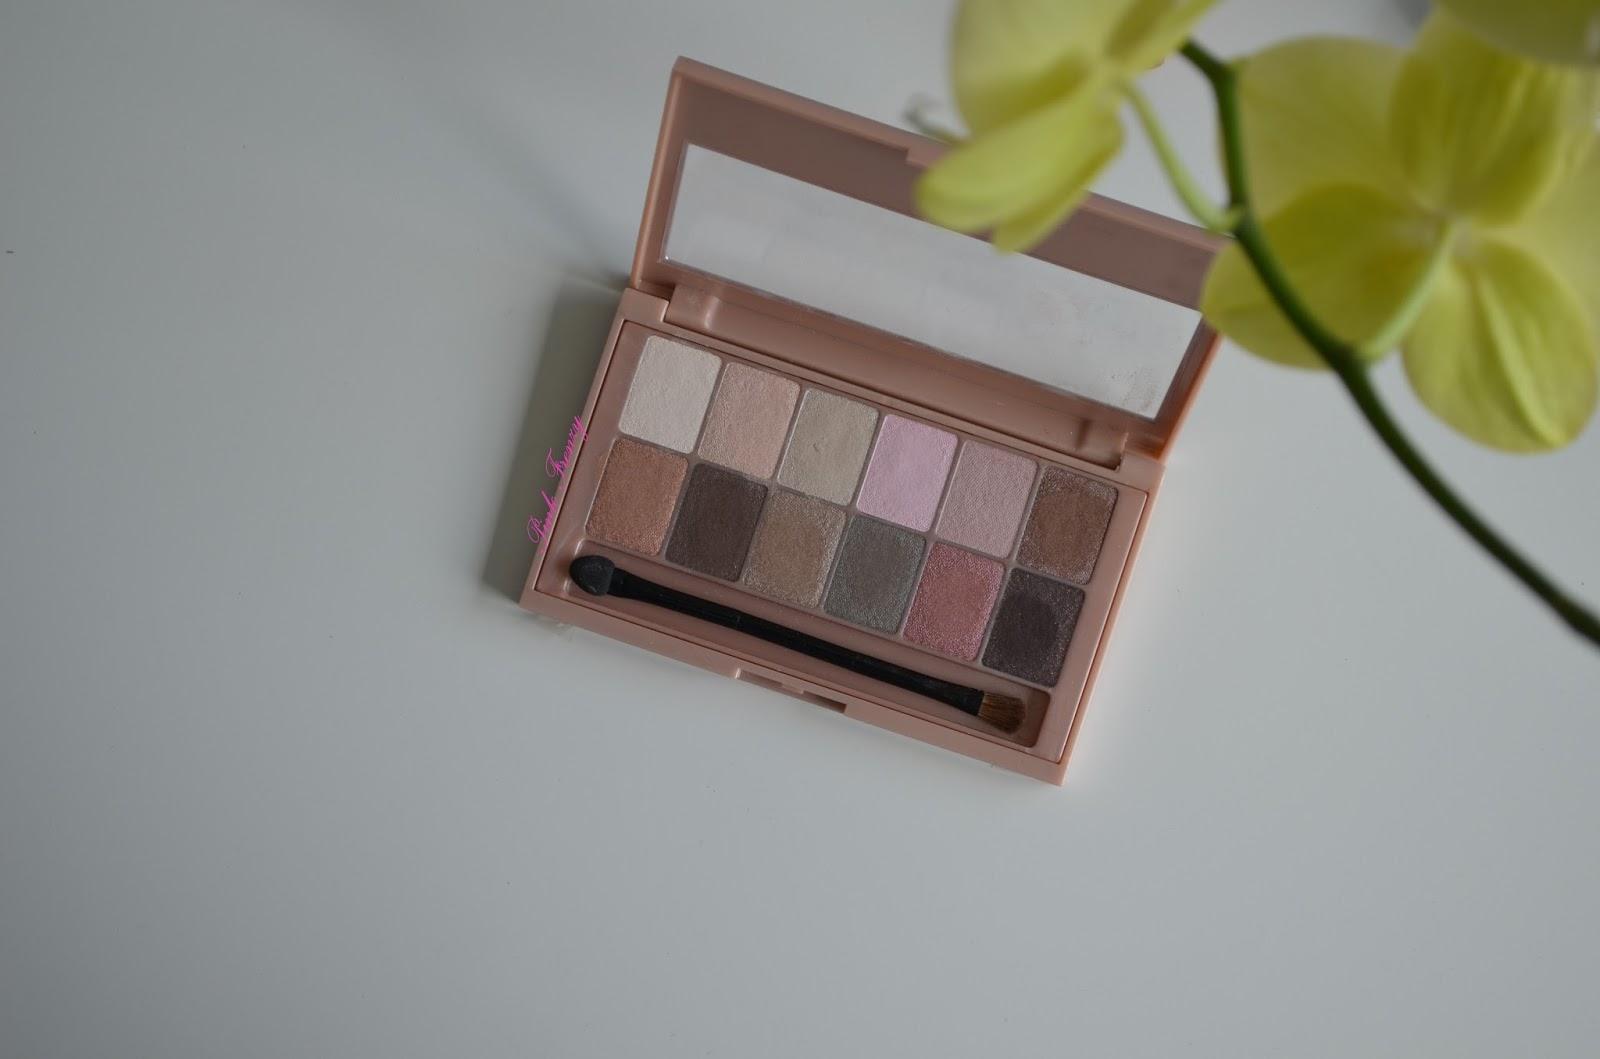 maybelline-nude-blush